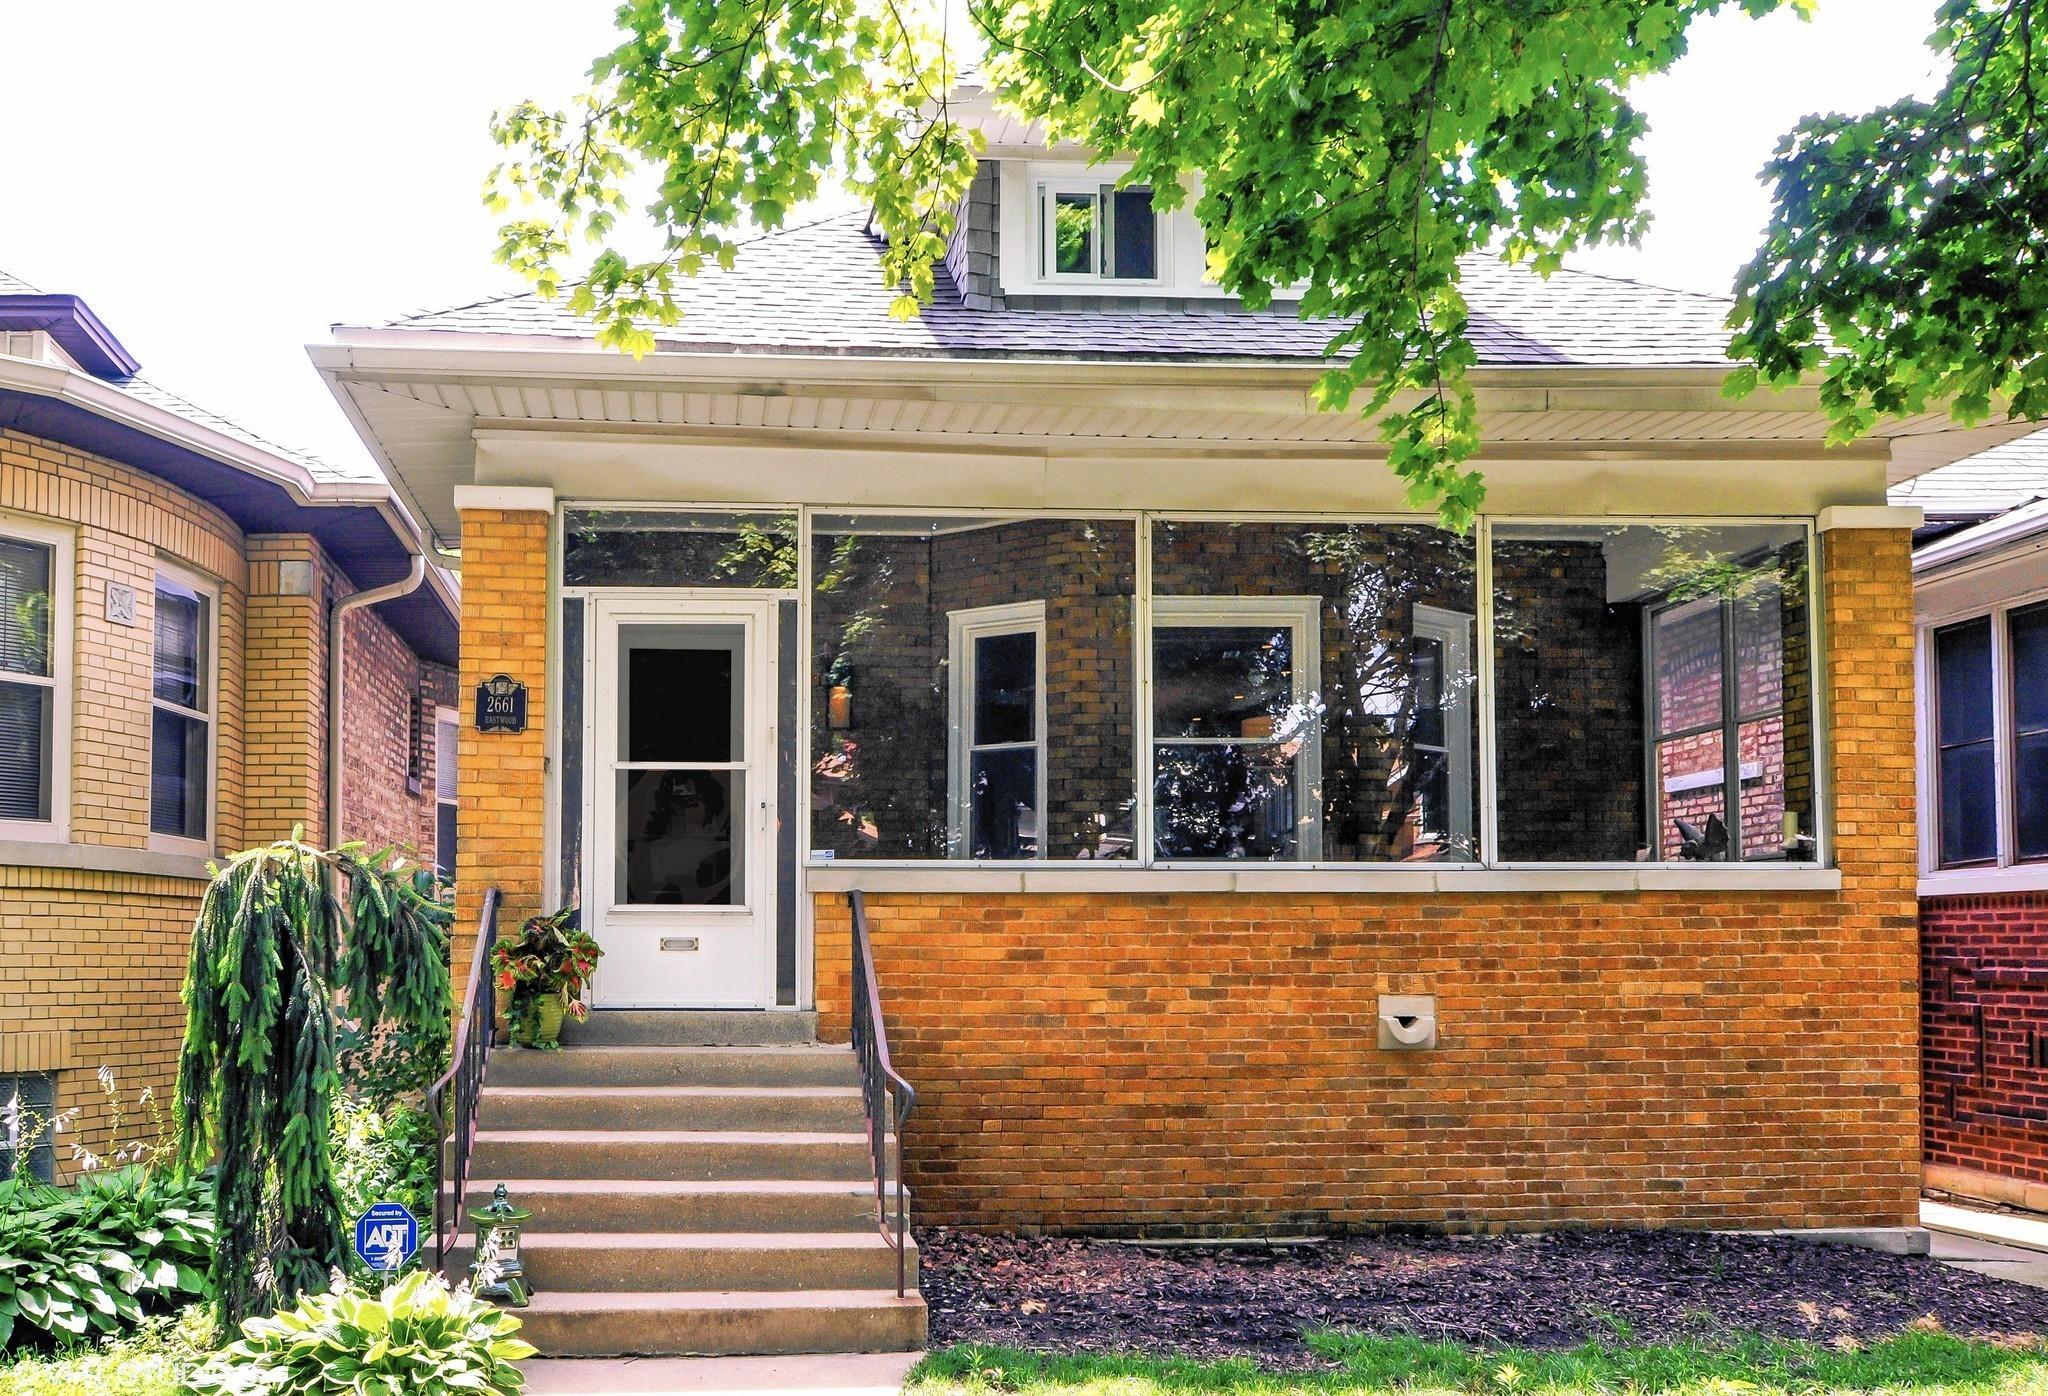 3 historic bungalows for under $1 million - Chicago Tribune